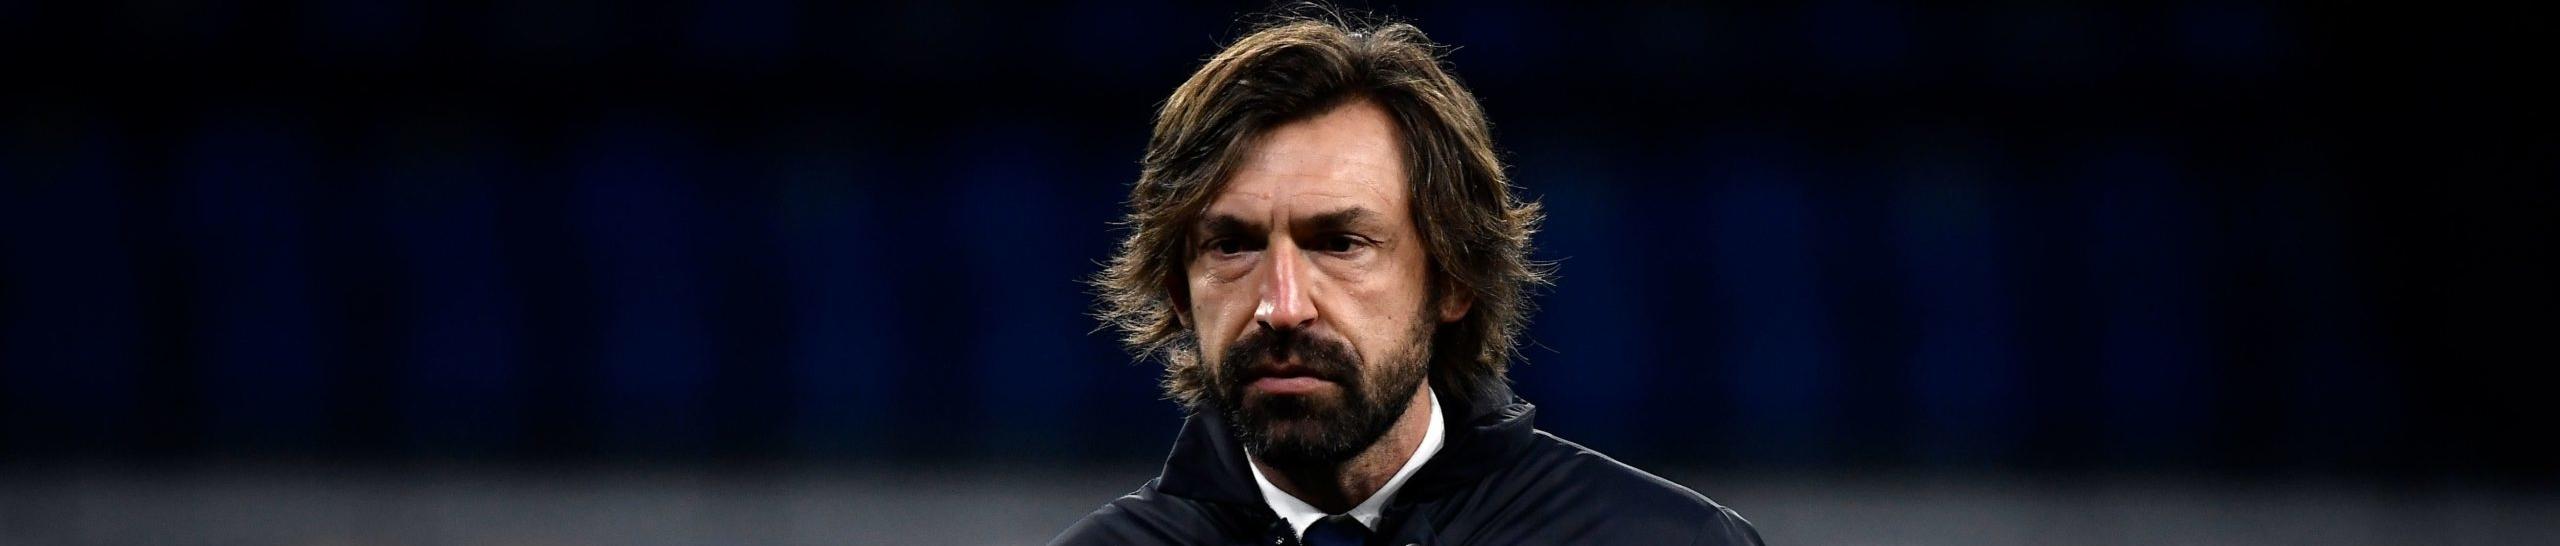 Pronostico Porto-Juventus, Pirlo senza Arthur, Bonucci e Cuadrado - le ultimissime